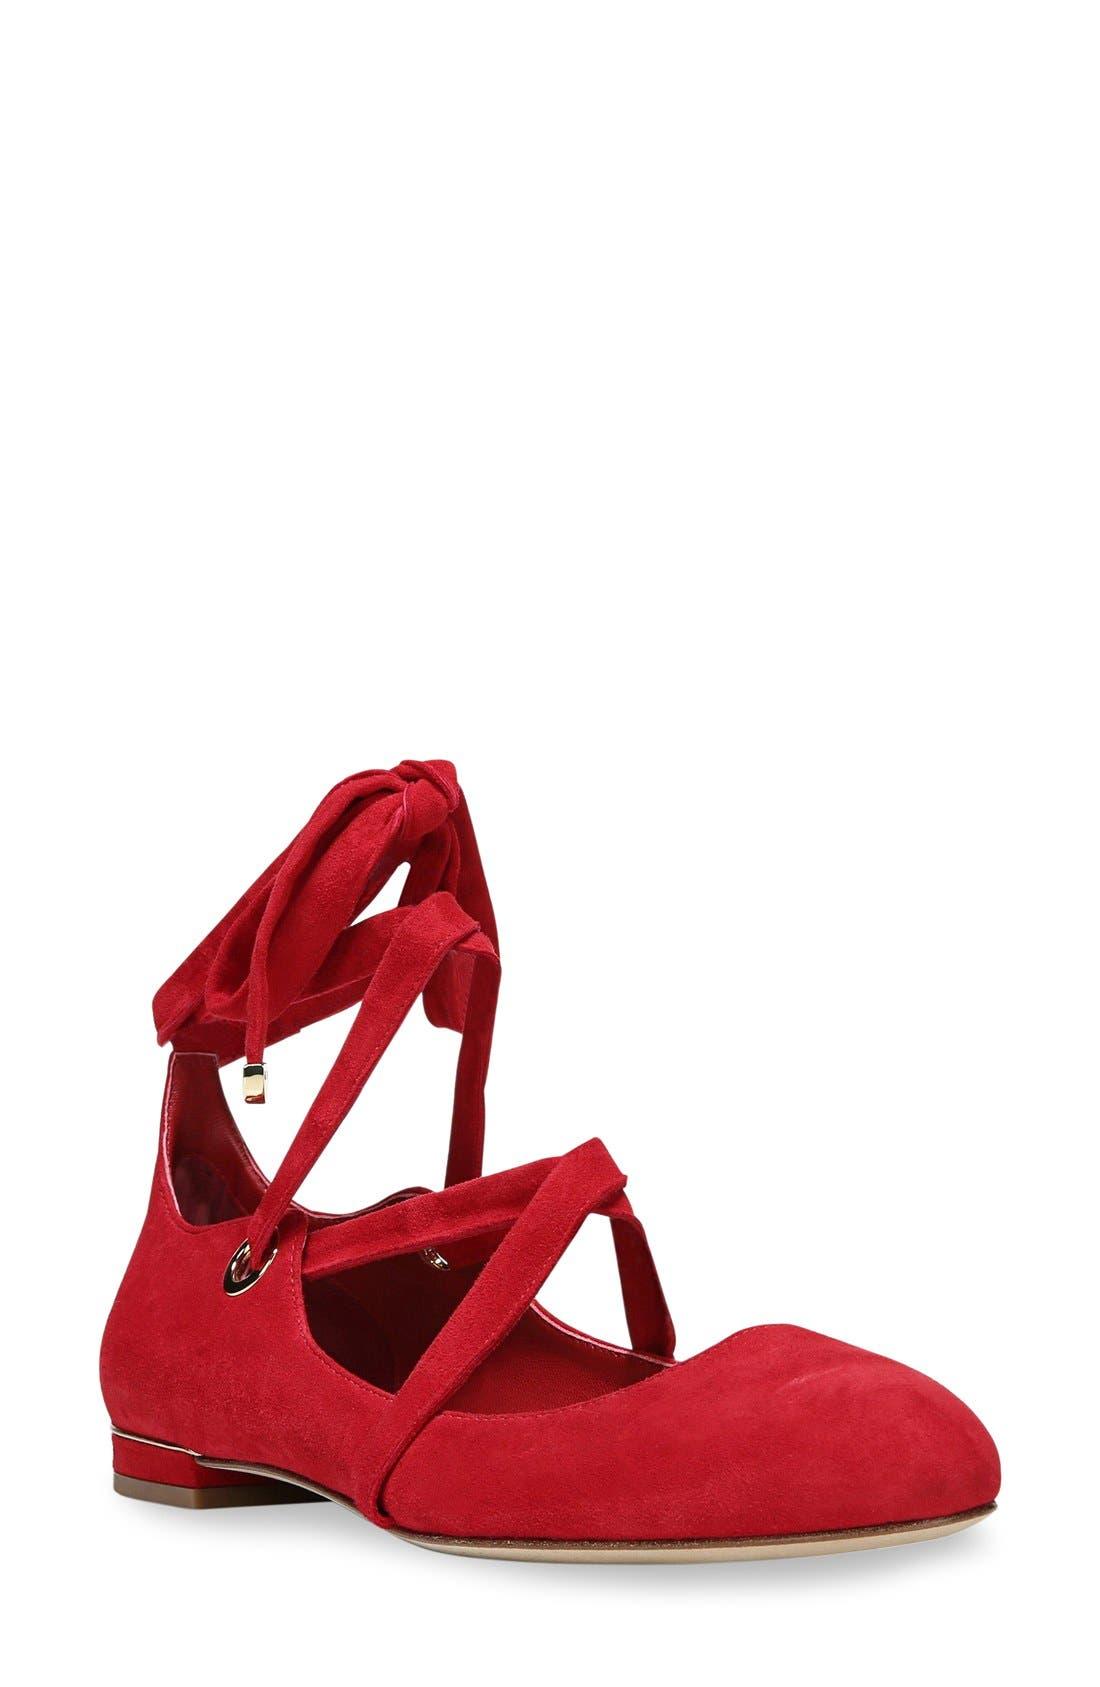 Alternate Image 1 Selected - Diane von Furstenberg Dakar Ankle Tie Flat (Women)